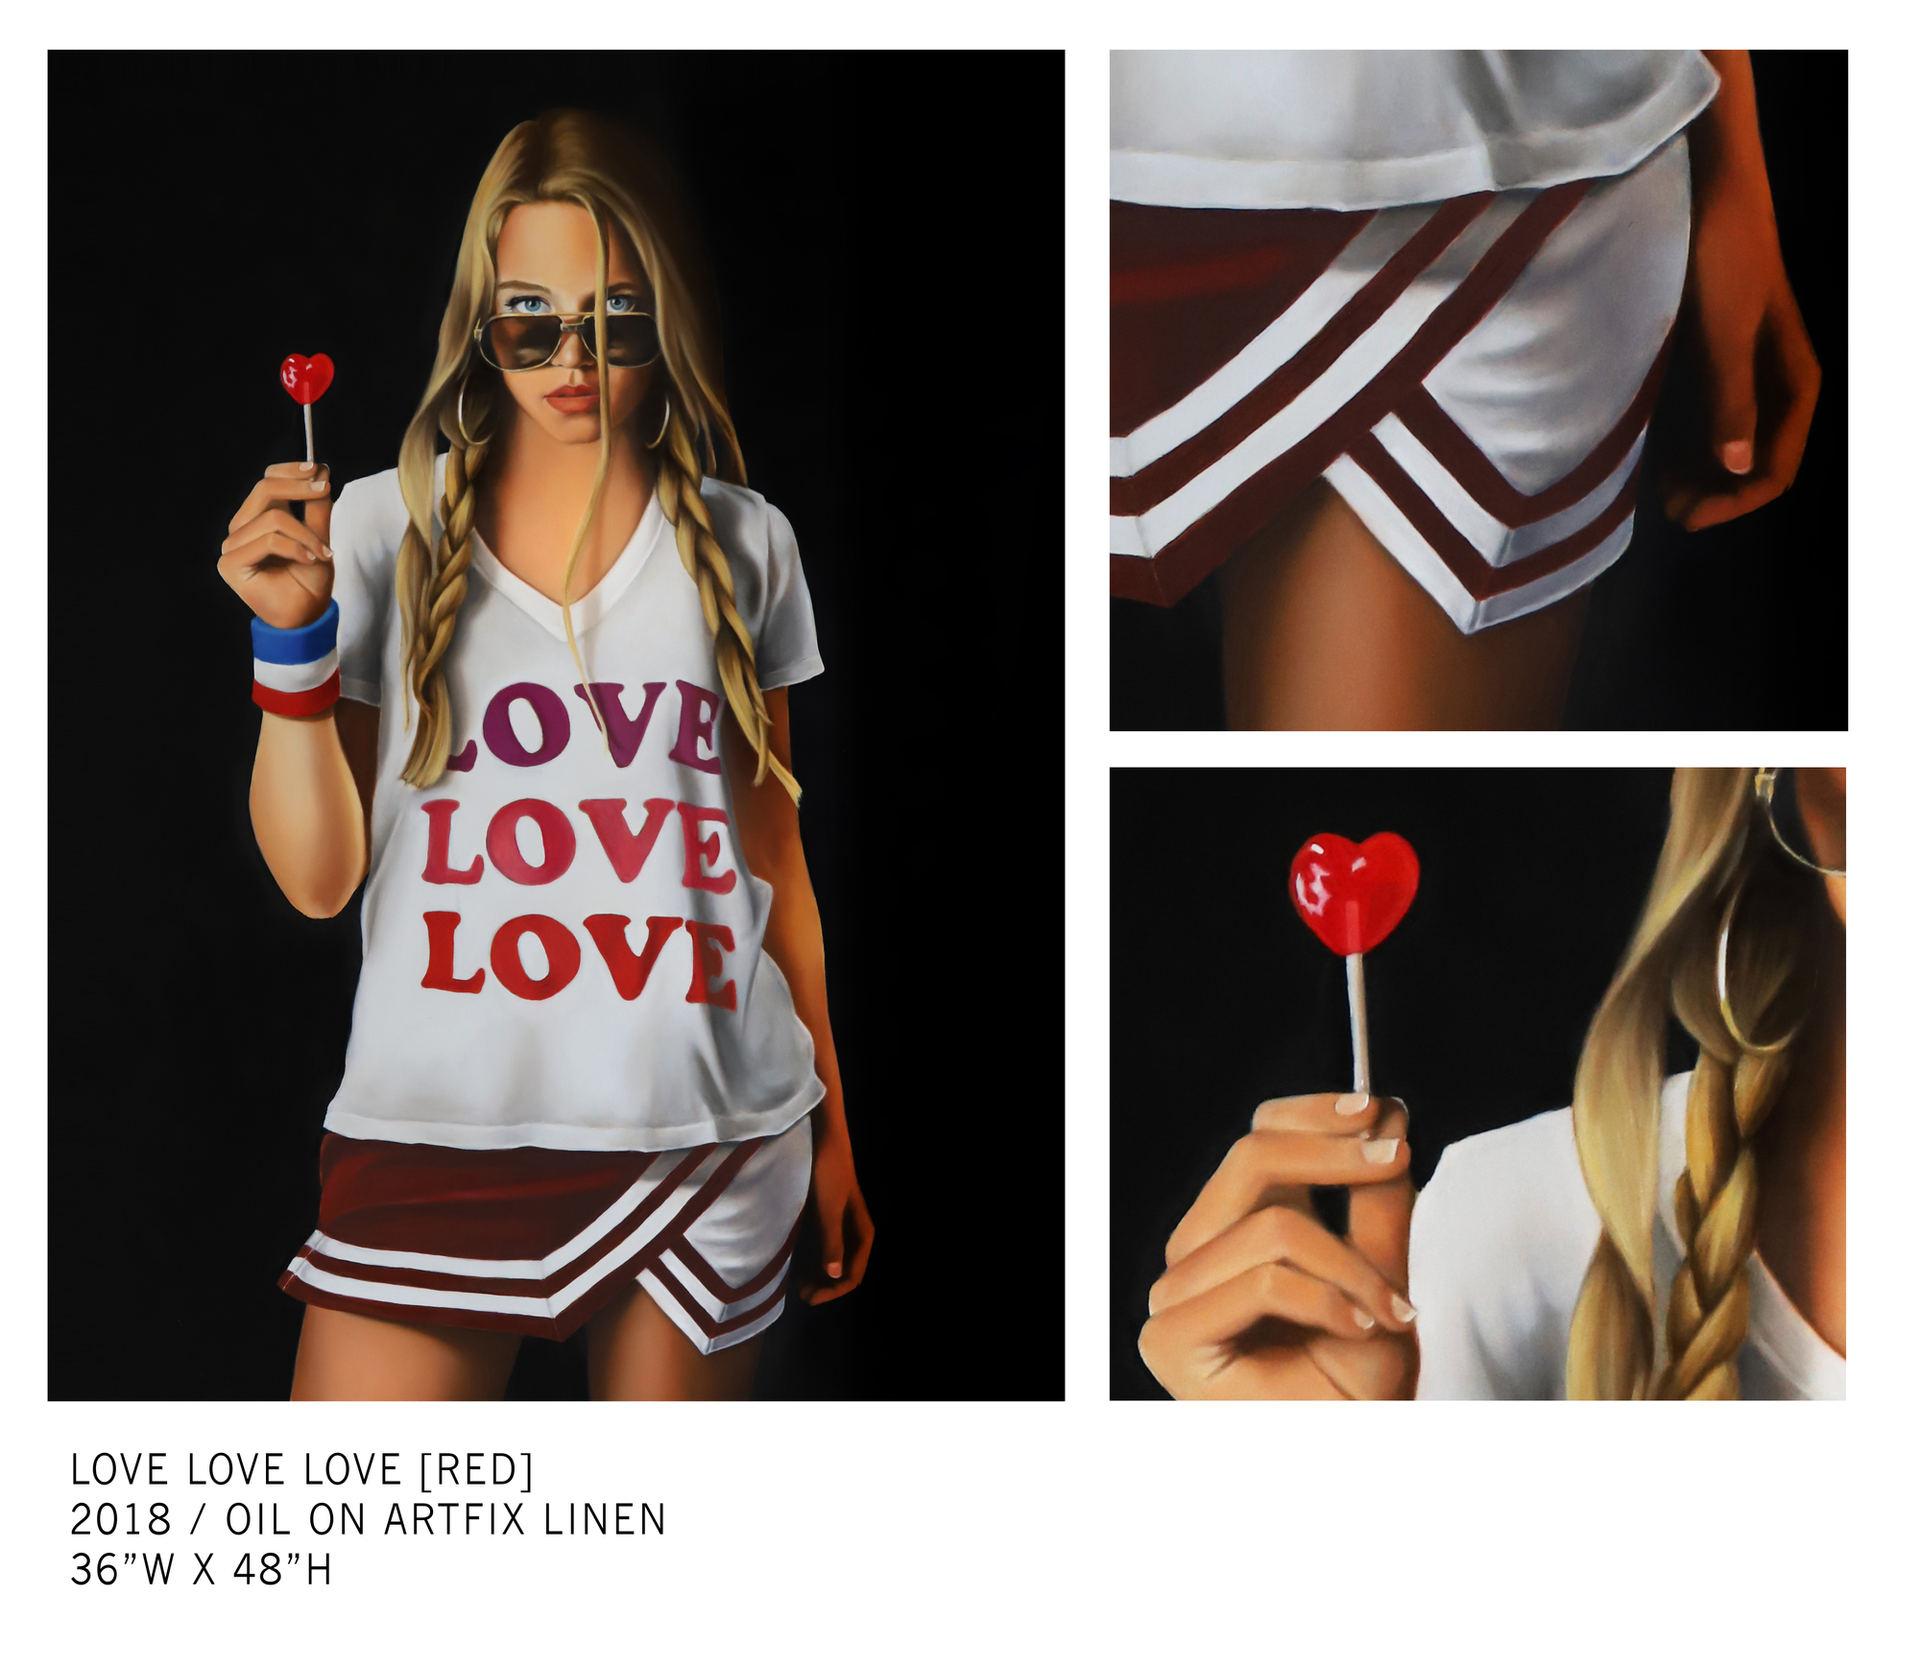 LOVE LOVE LOVE [RED]